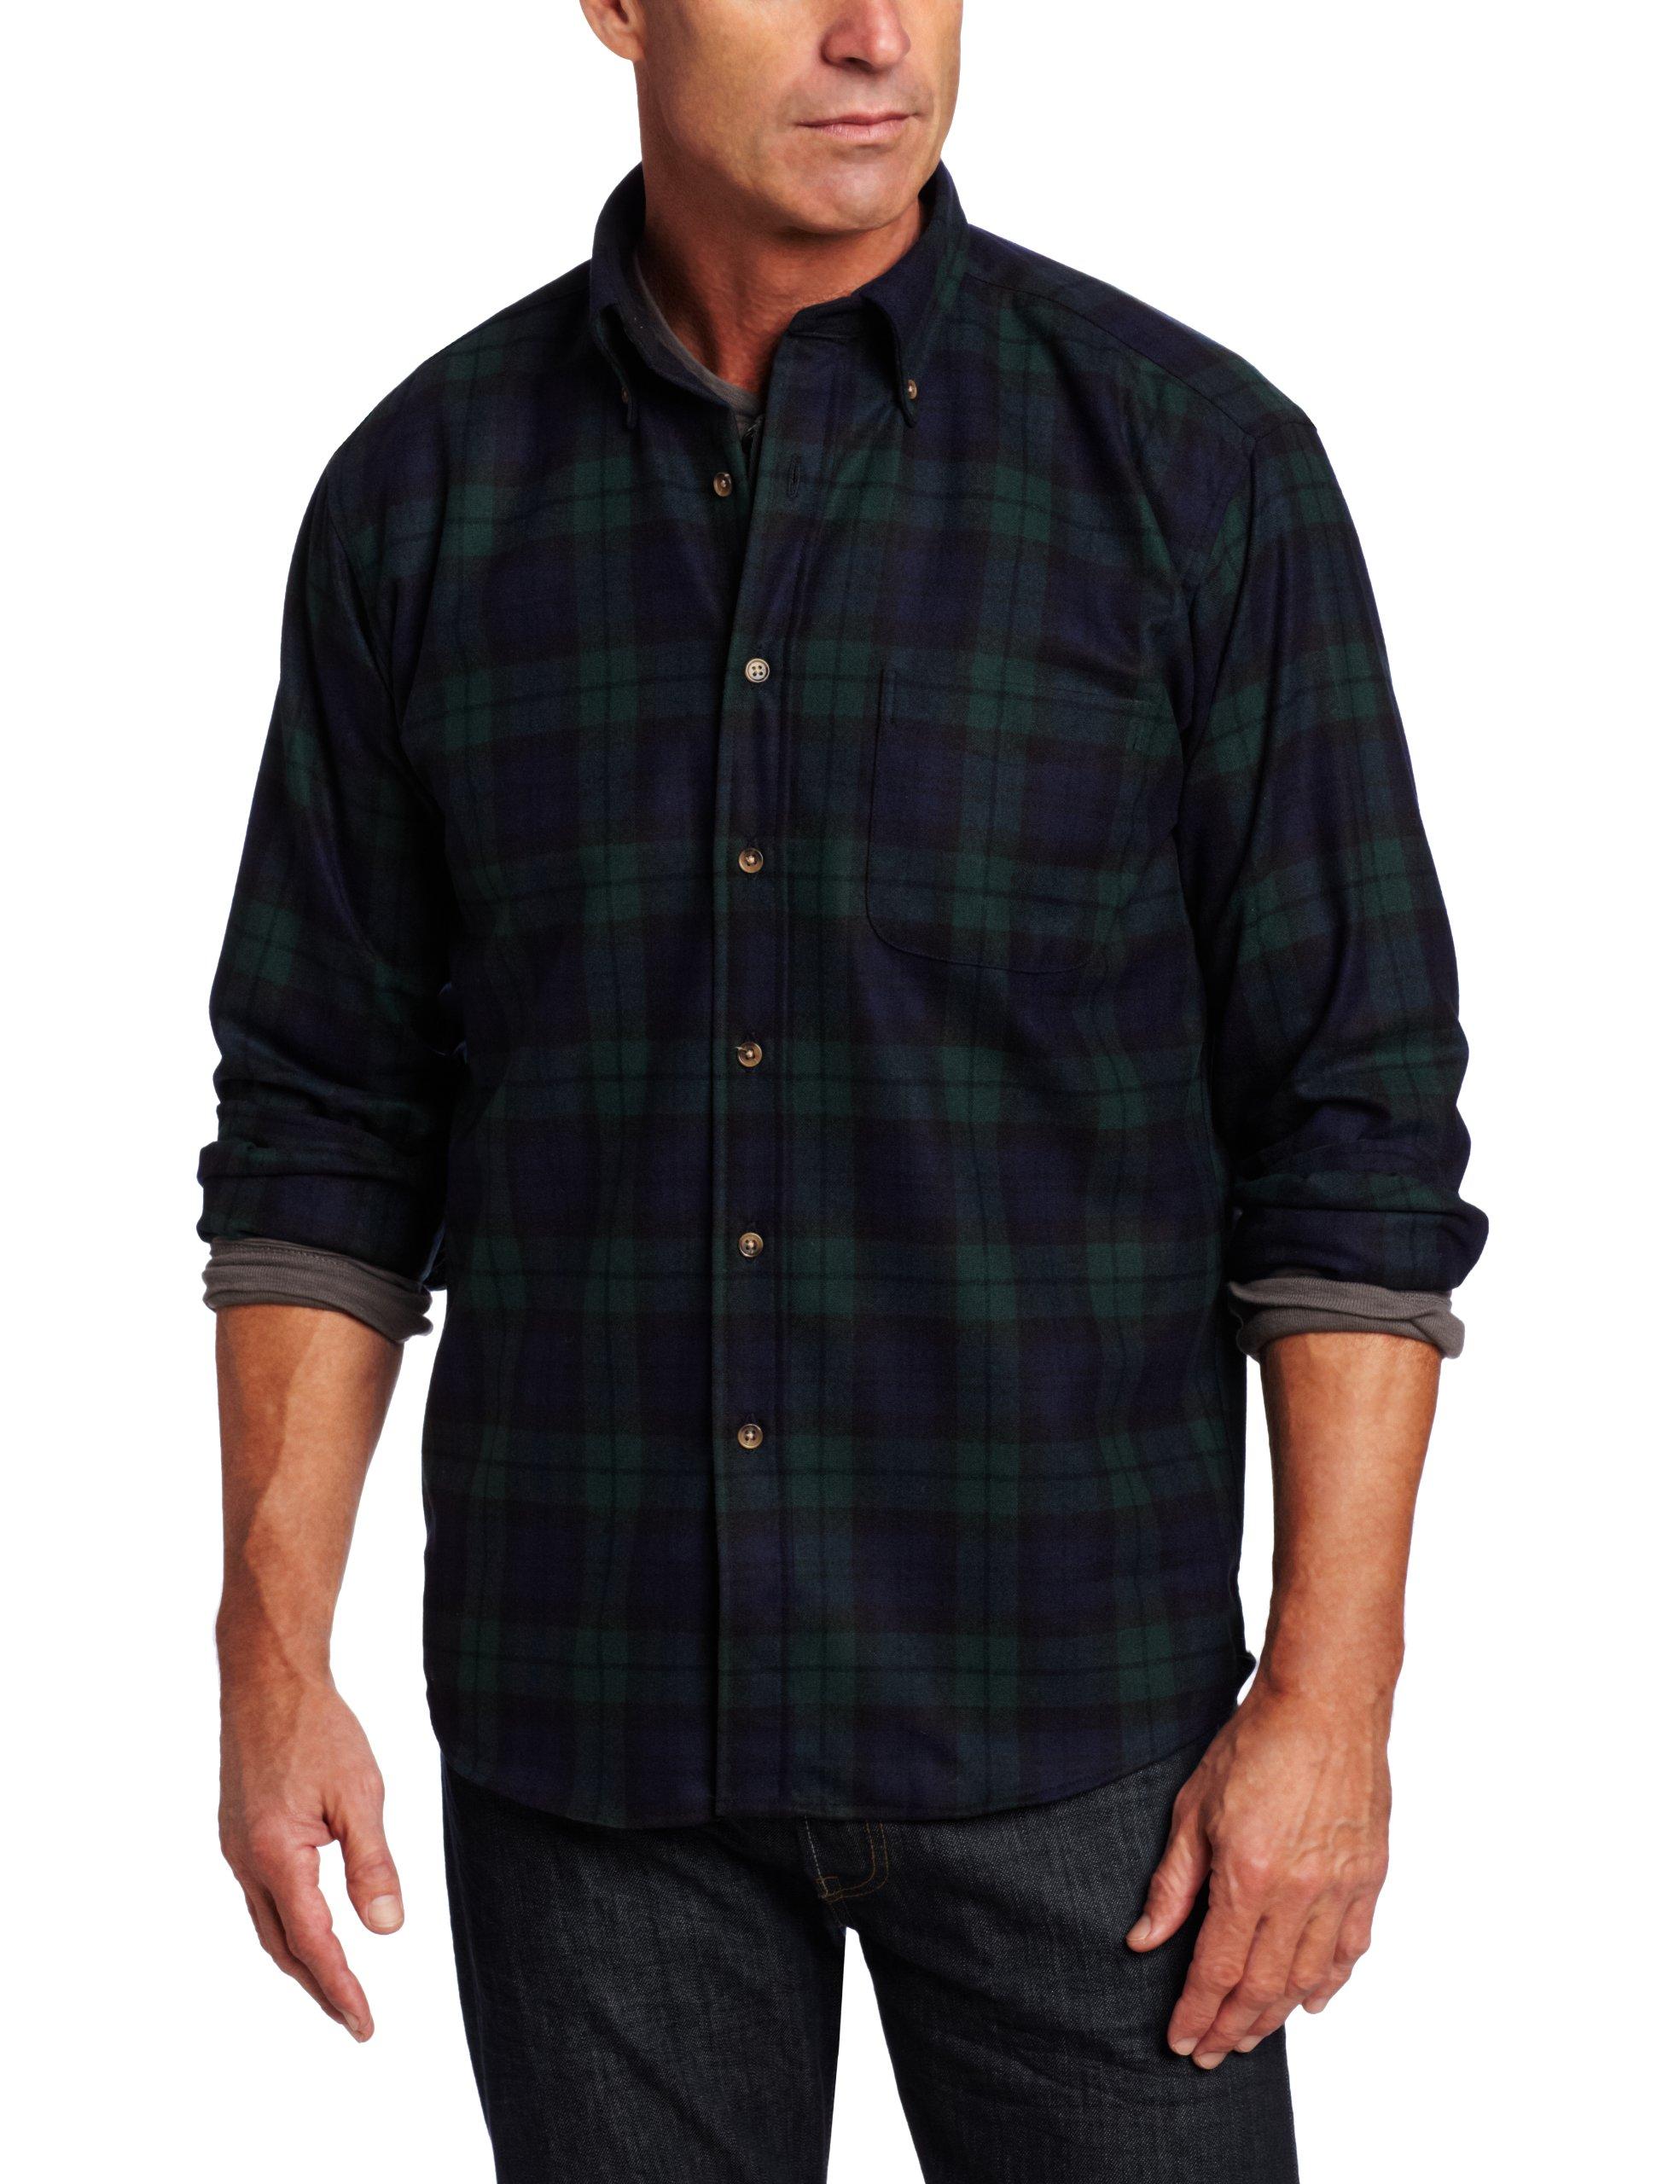 Pendleton Men's Long Sleeve Button Front Classic-fit Fireside Shirt, Black Watch Tartan-30069, MD